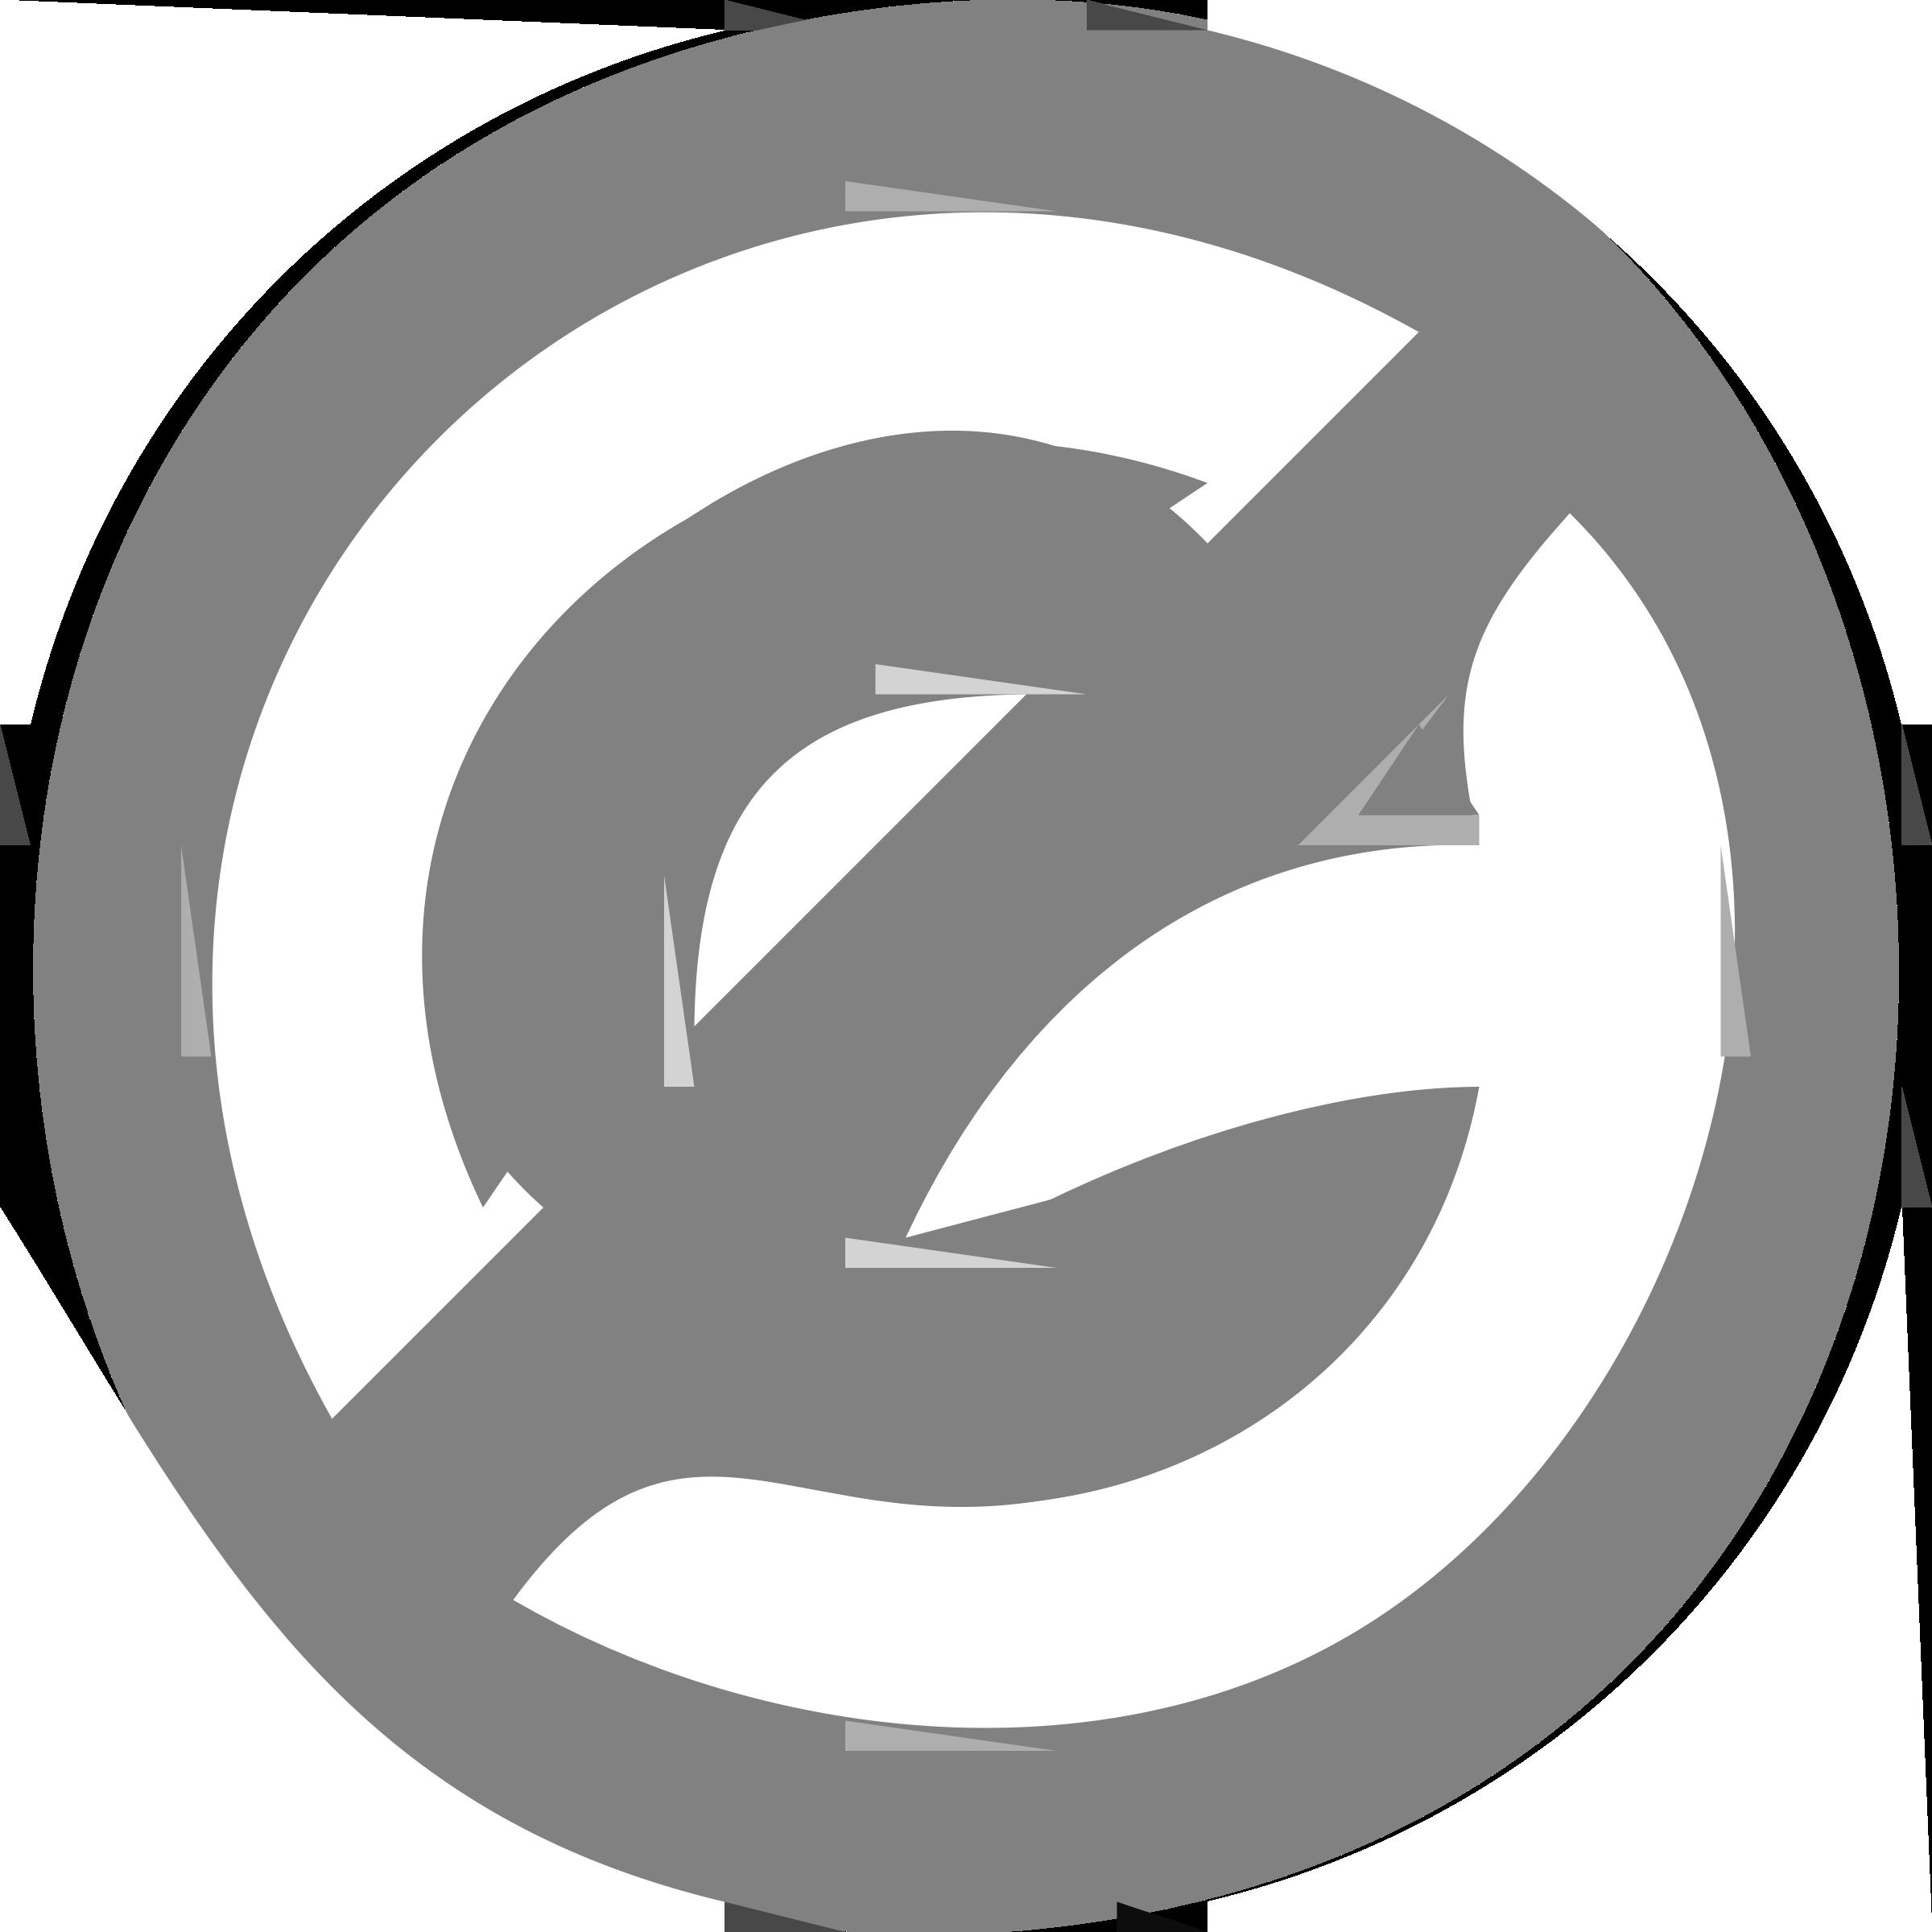 Public Domain Icon vector clipart image.